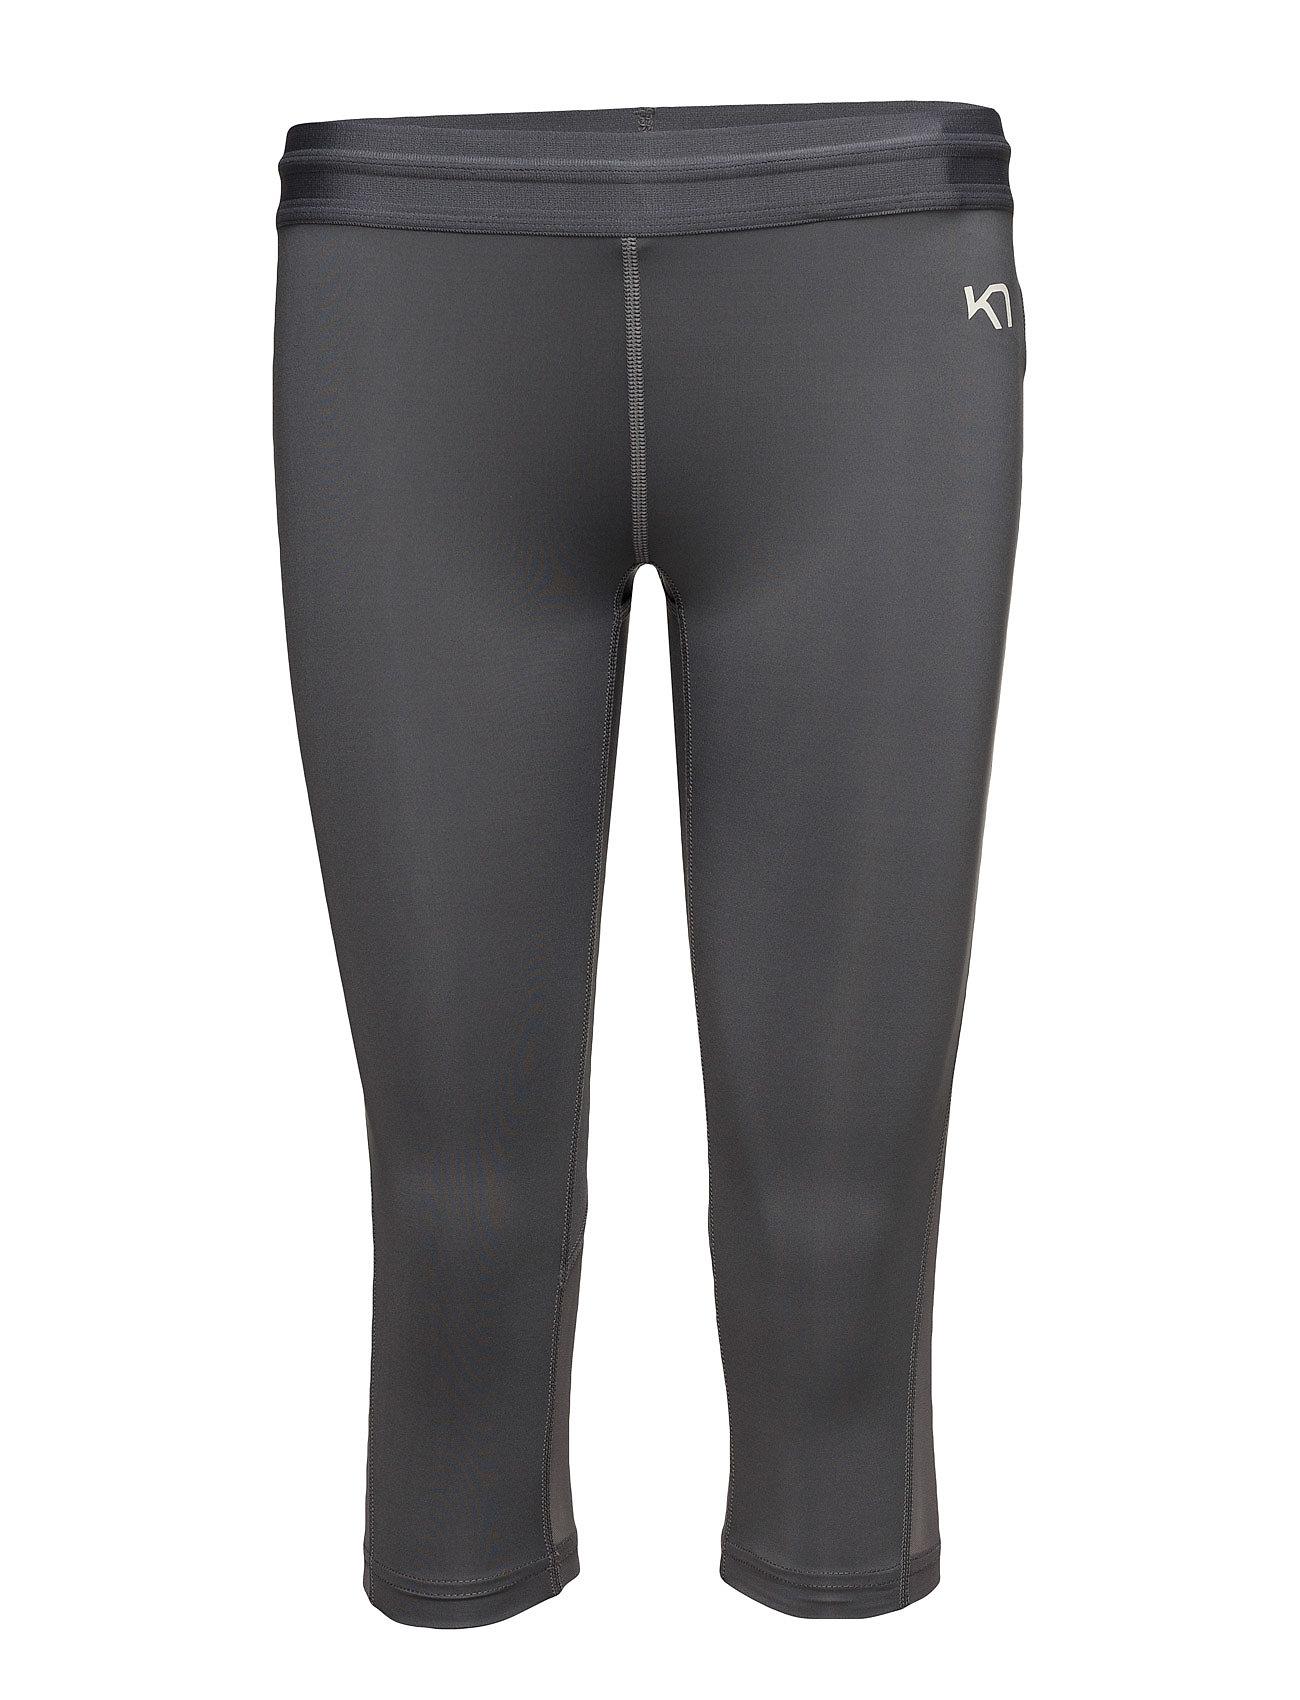 Marte Capri Kari Traa Sportstøj til Kvinder i